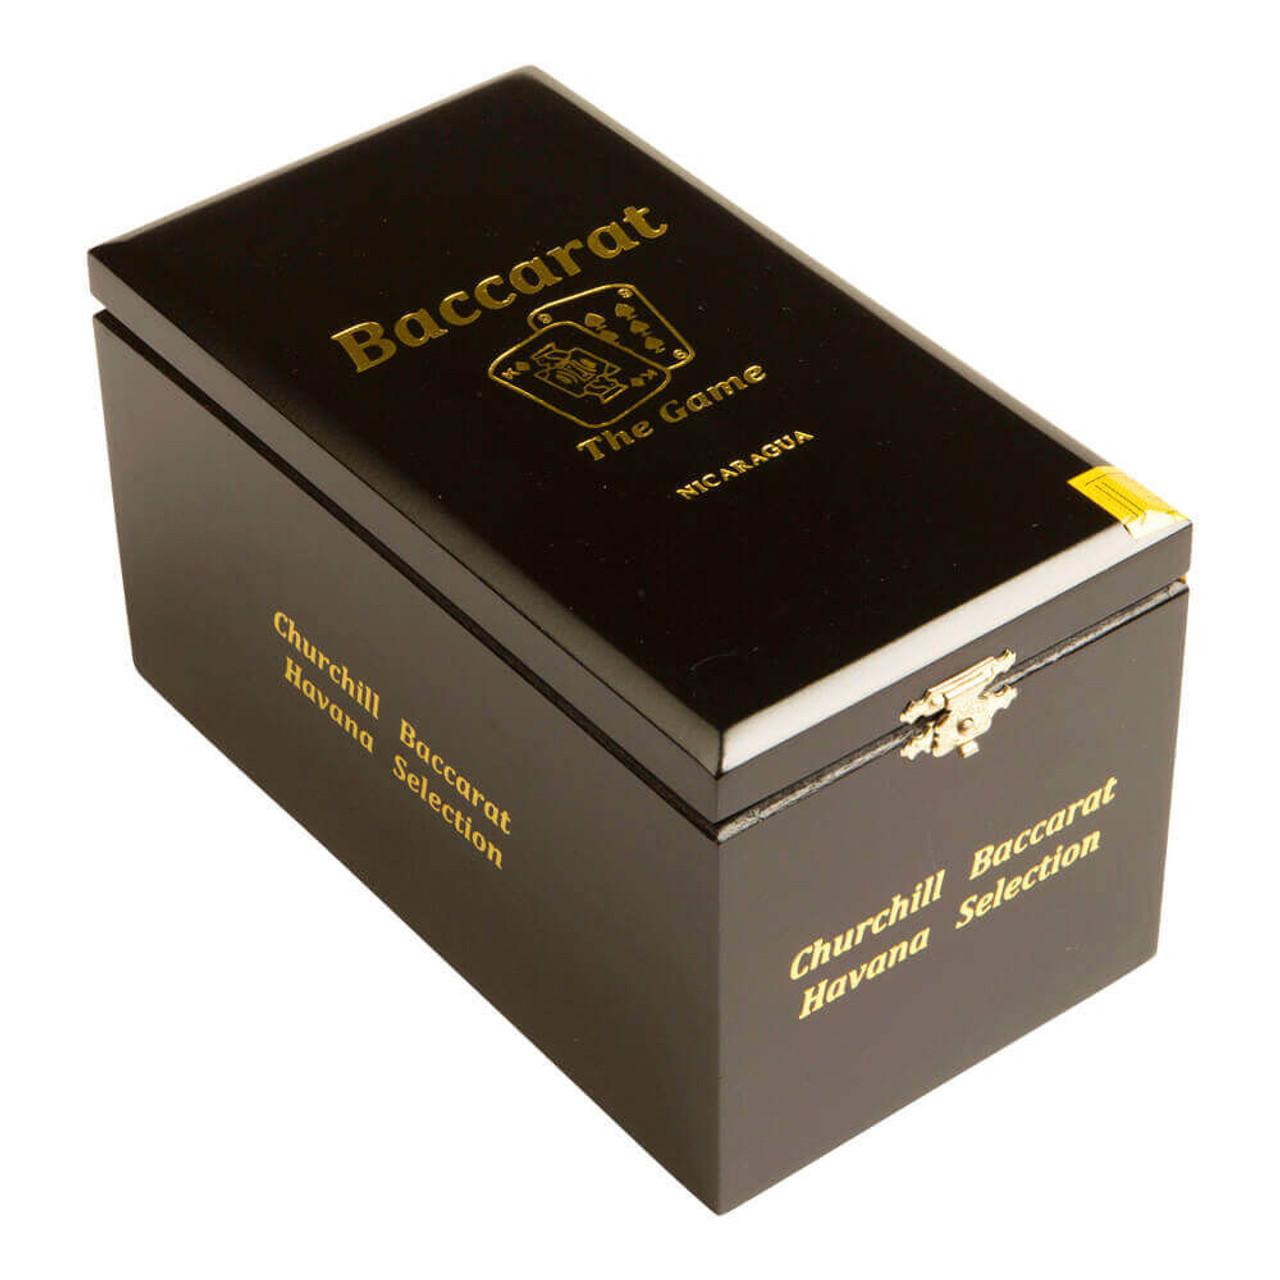 Baccarat Nicaragua Petit Corona Cigars - 5.5 x 44 (Box of 25)